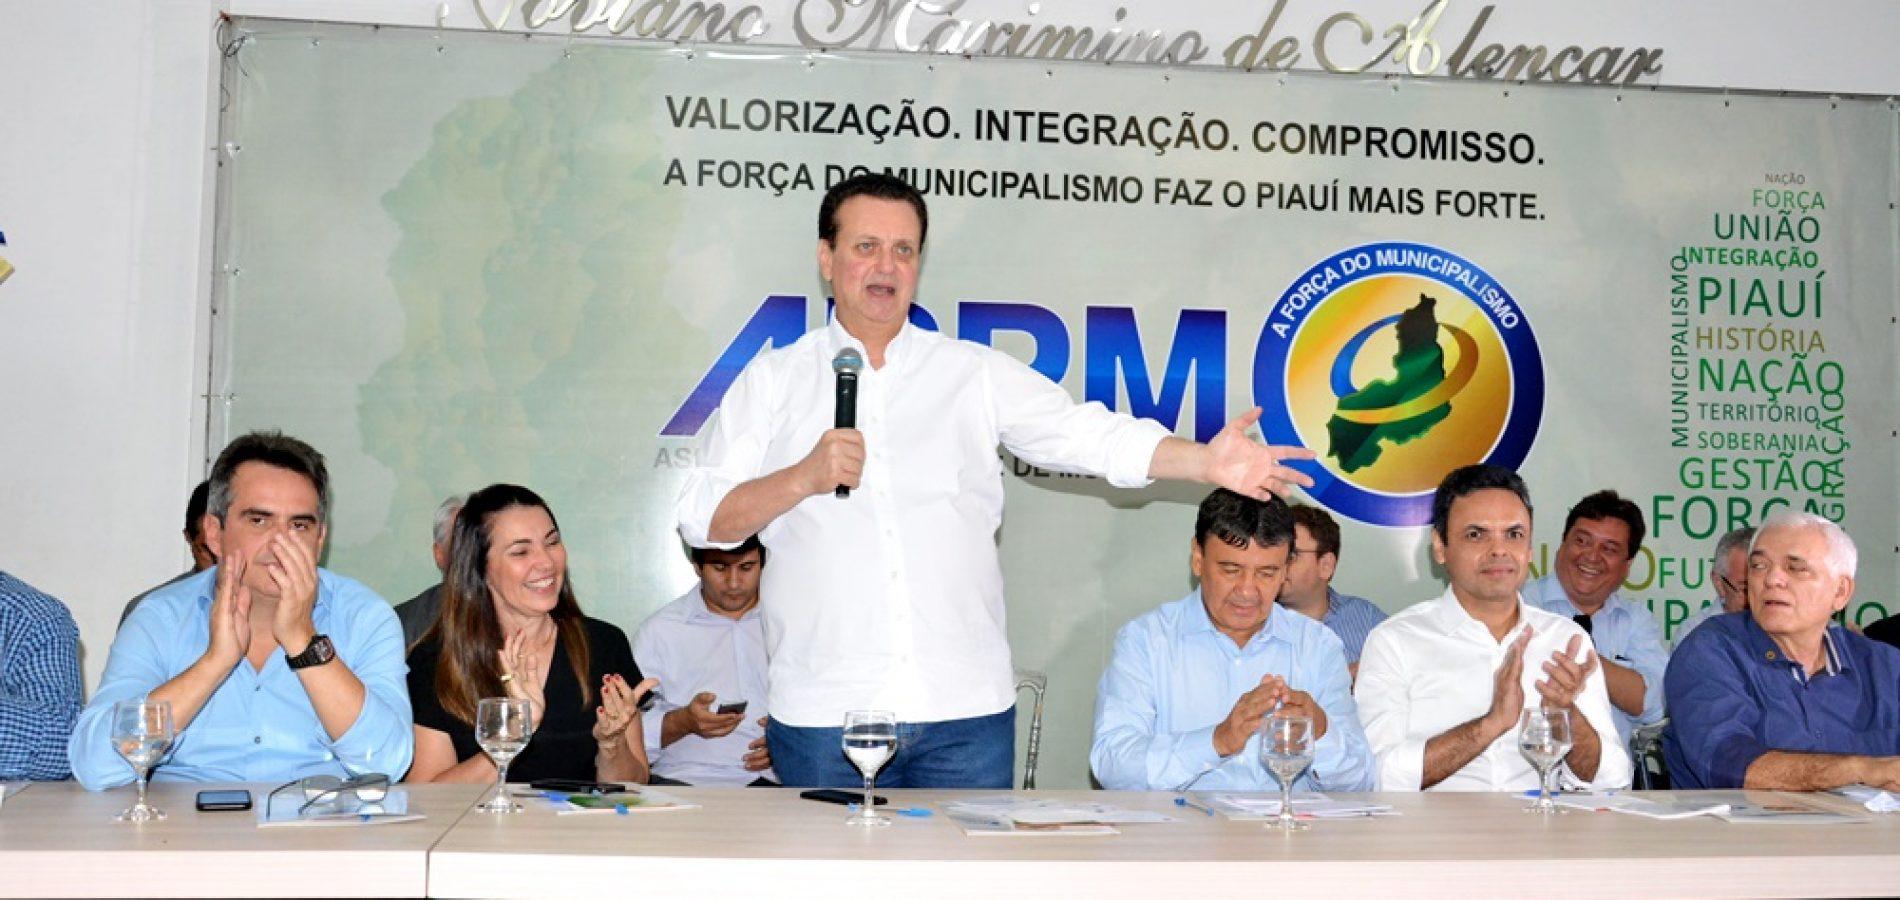 FOTOS | Solenidade do programa 'Internet para Todos' no Piauí